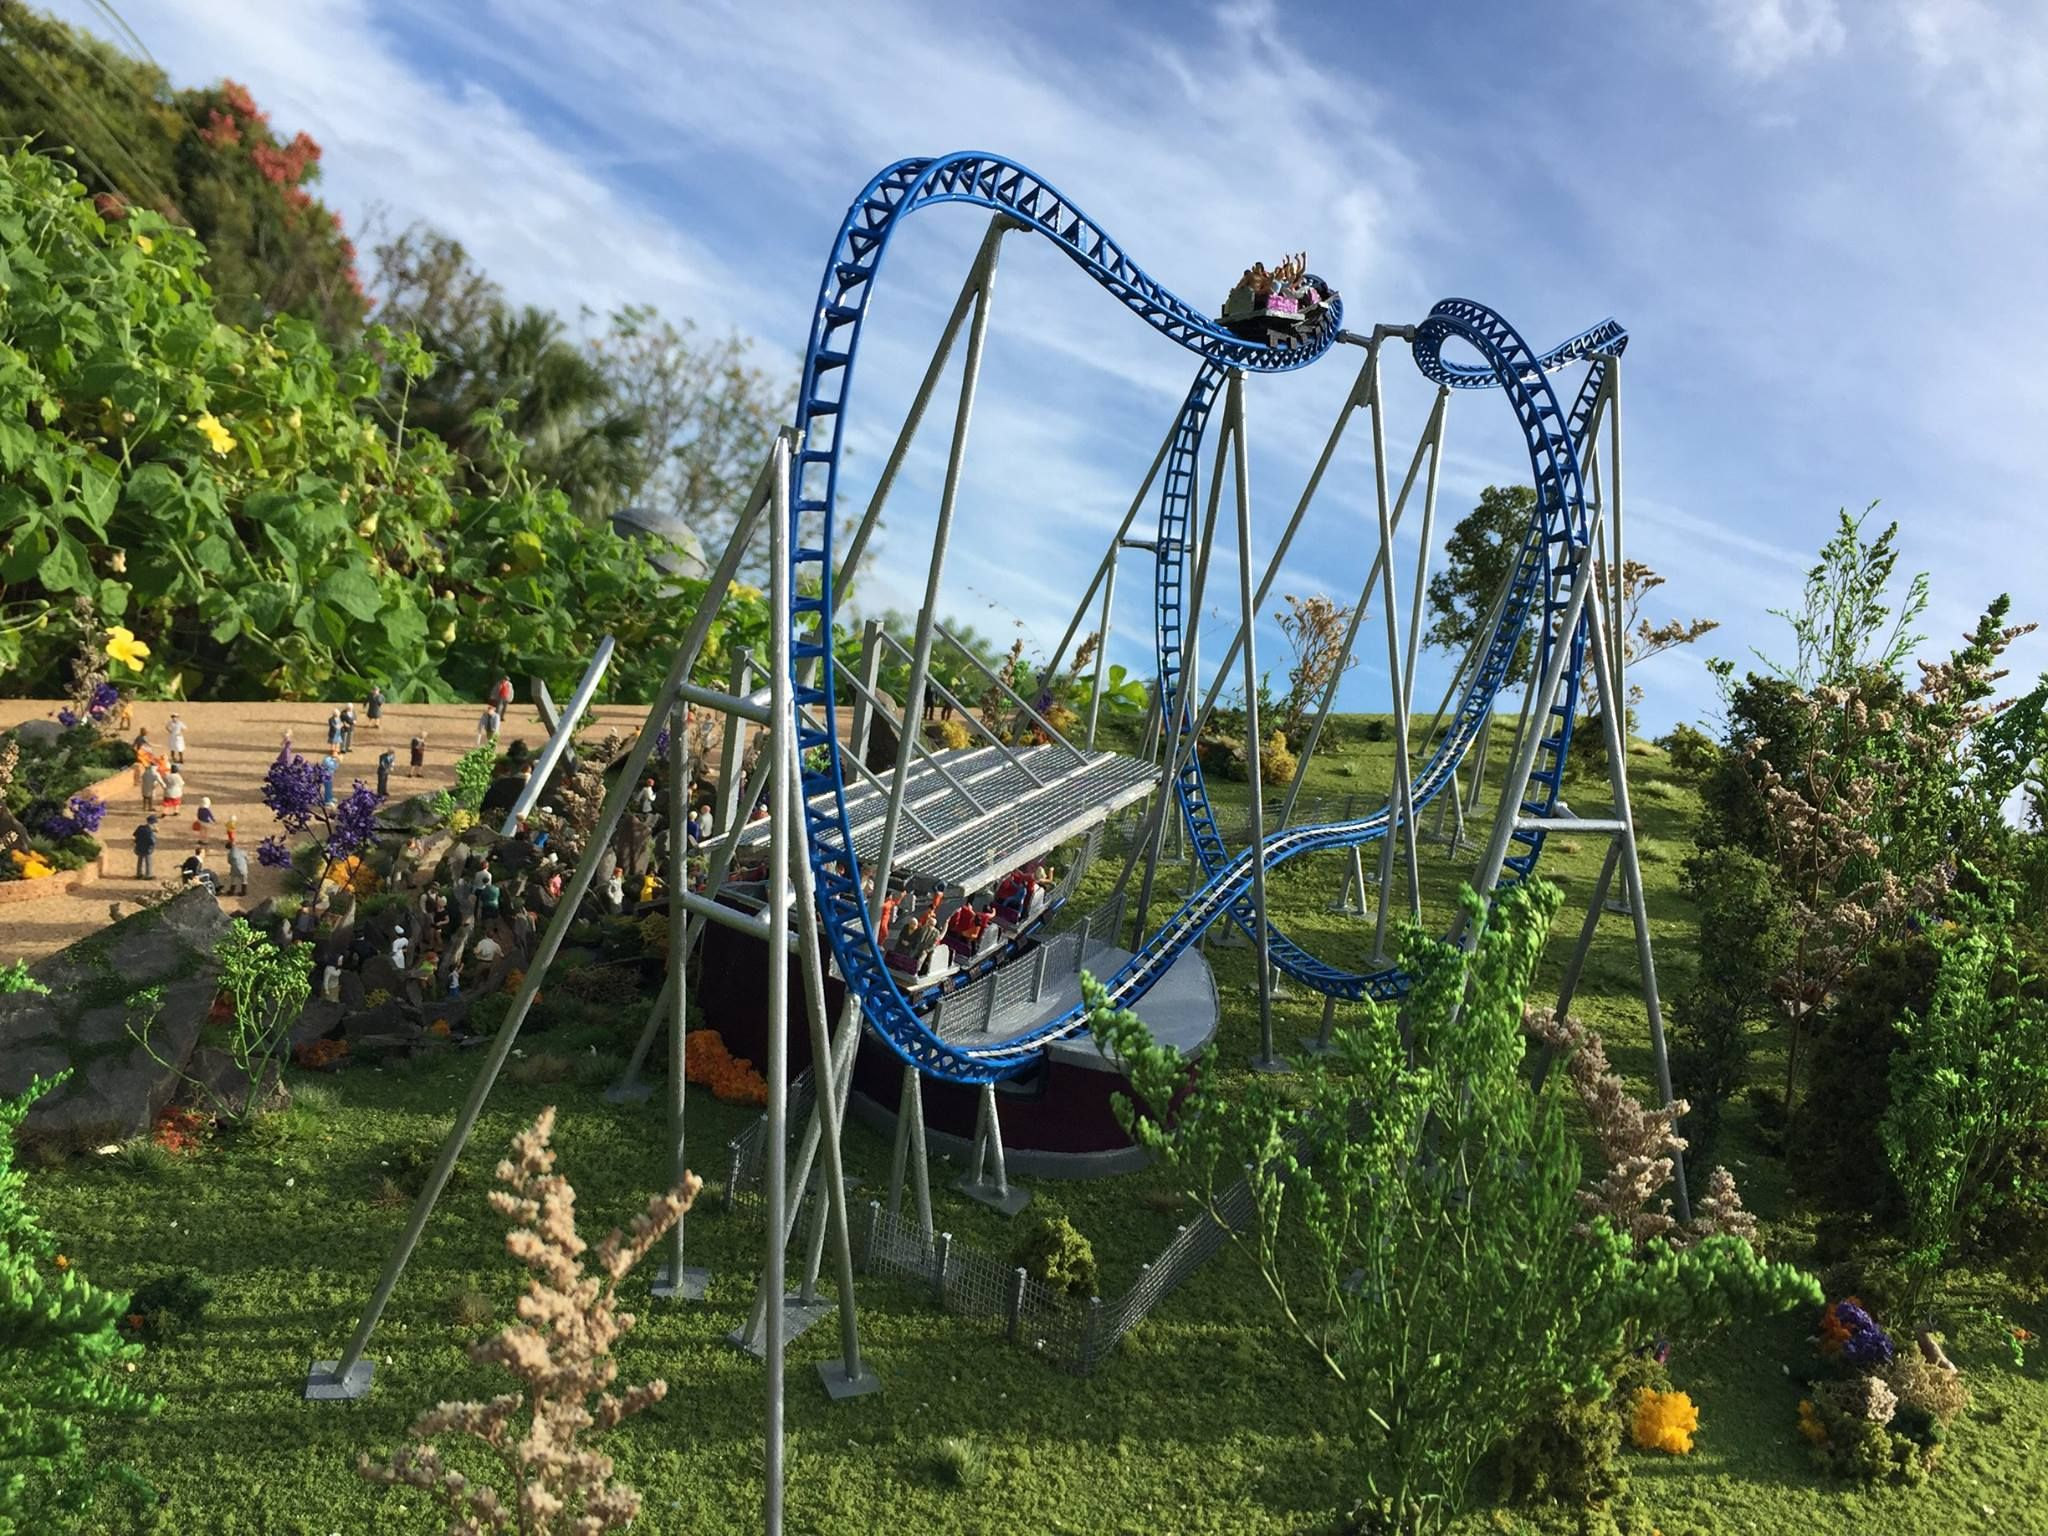 Mack Rides Roller Coaster Model Theme Parks Rides Roller Coaster Theme Park